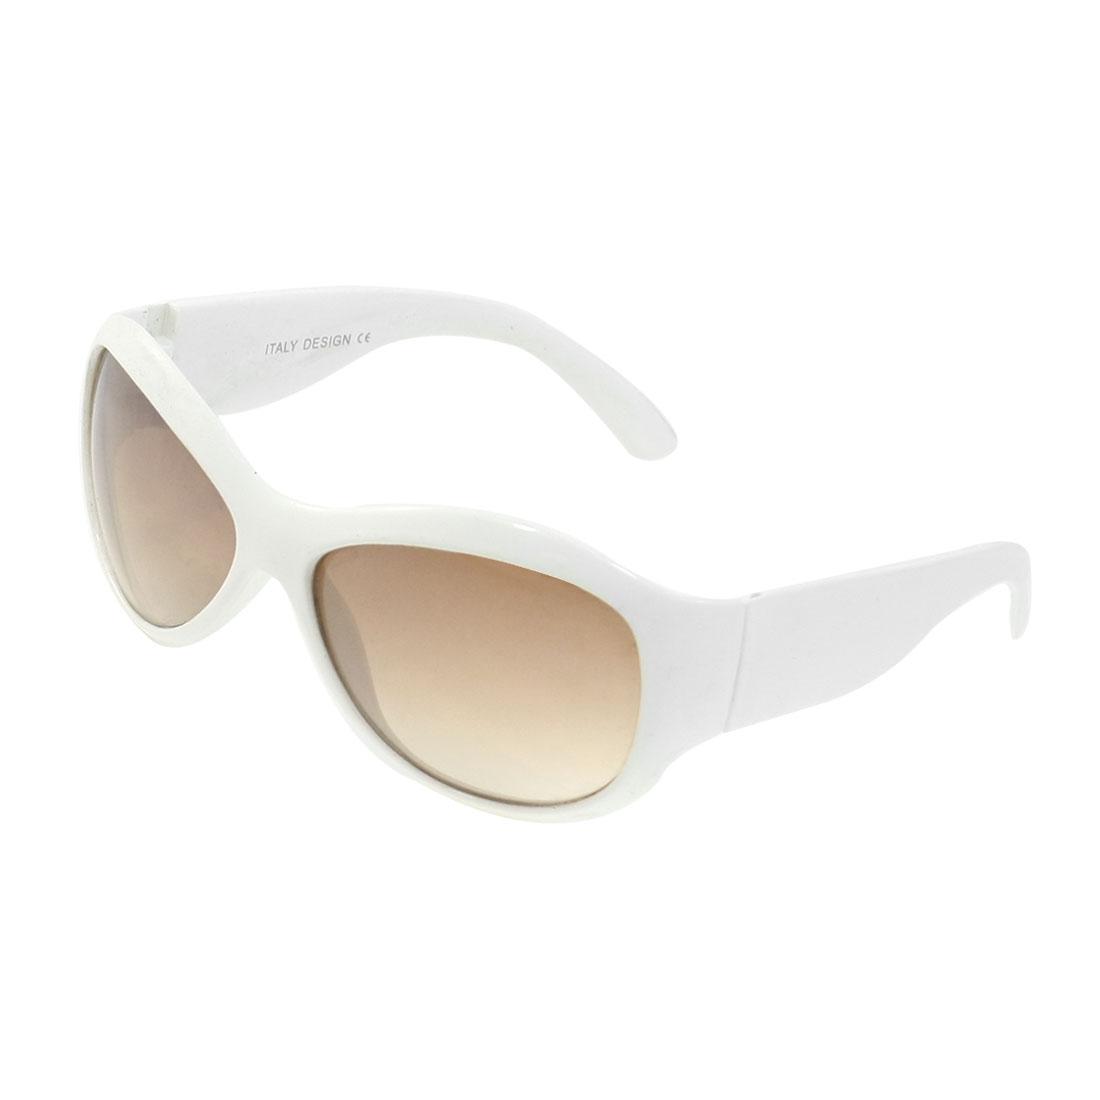 Waterdrop Shape Lens White Plastic Full Frame Sunglasses Eyewear for Lady